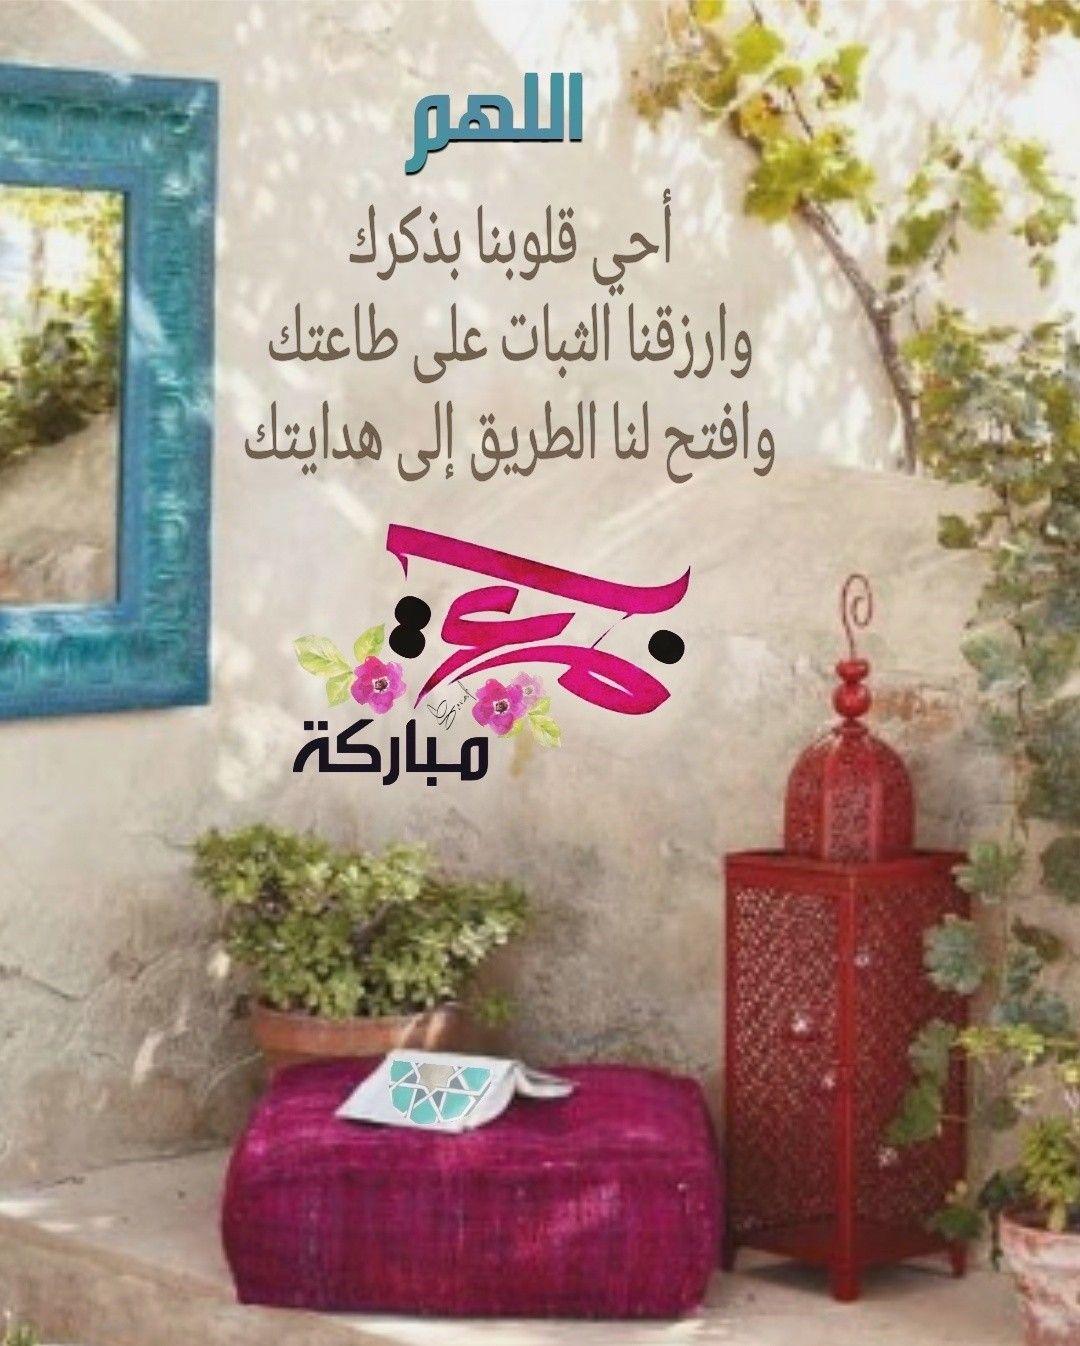 Pin By ام حوراء بو صفر On صباح الخير Blessed Friday Islamic Images Jumma Mubarak Images